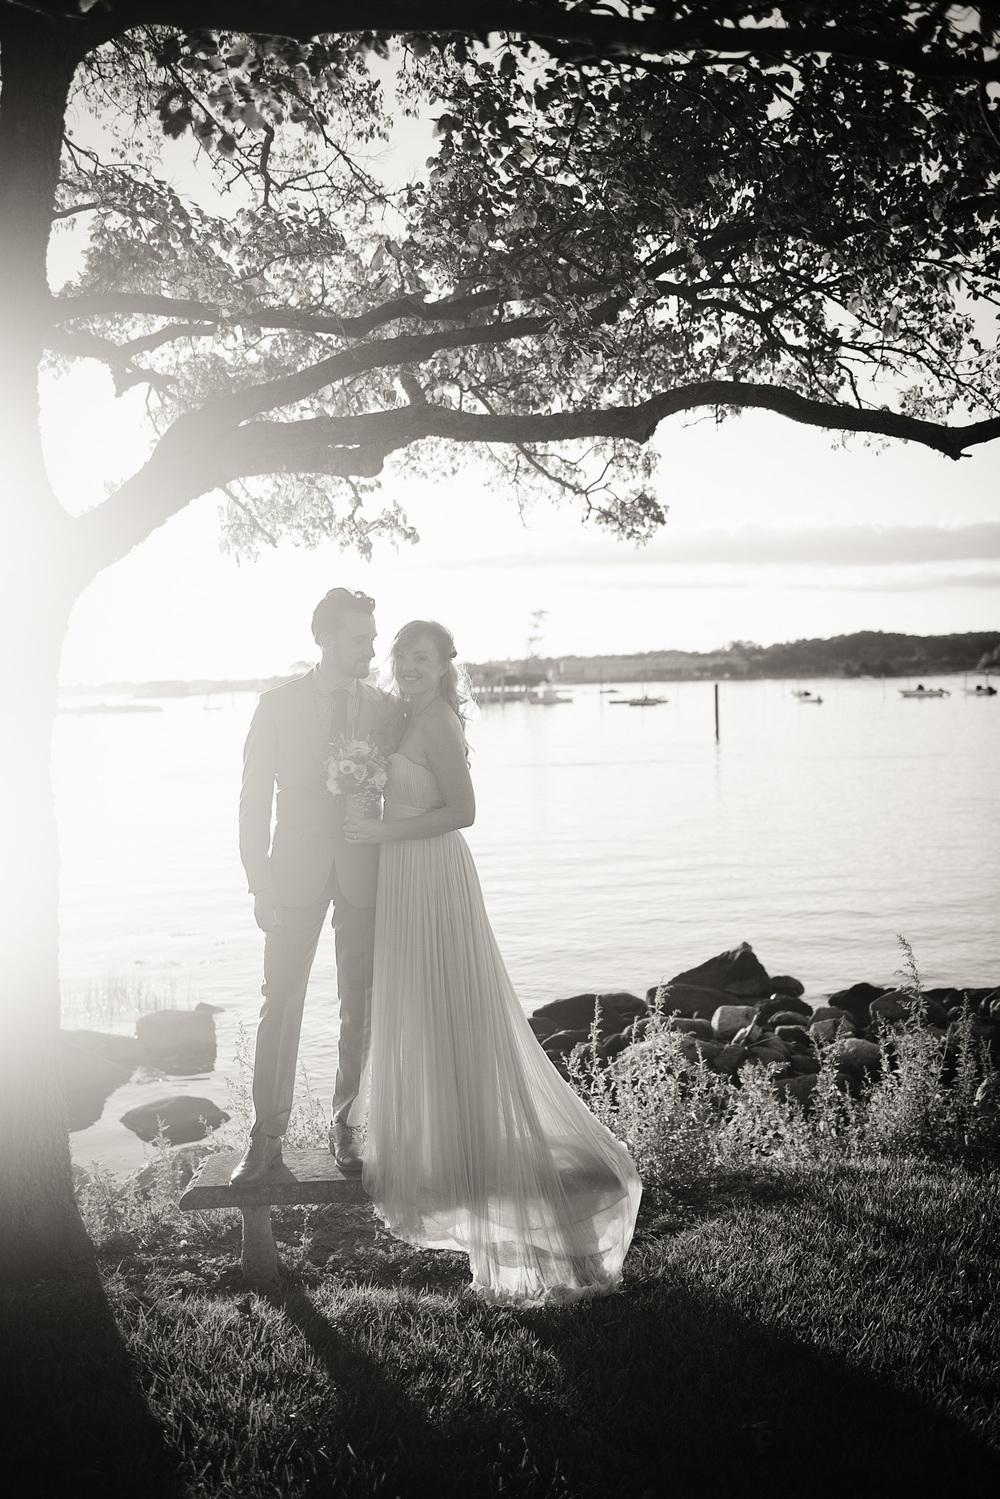 bride groom silhouette sunset bench tree beautiful husband wife coast ocean New England